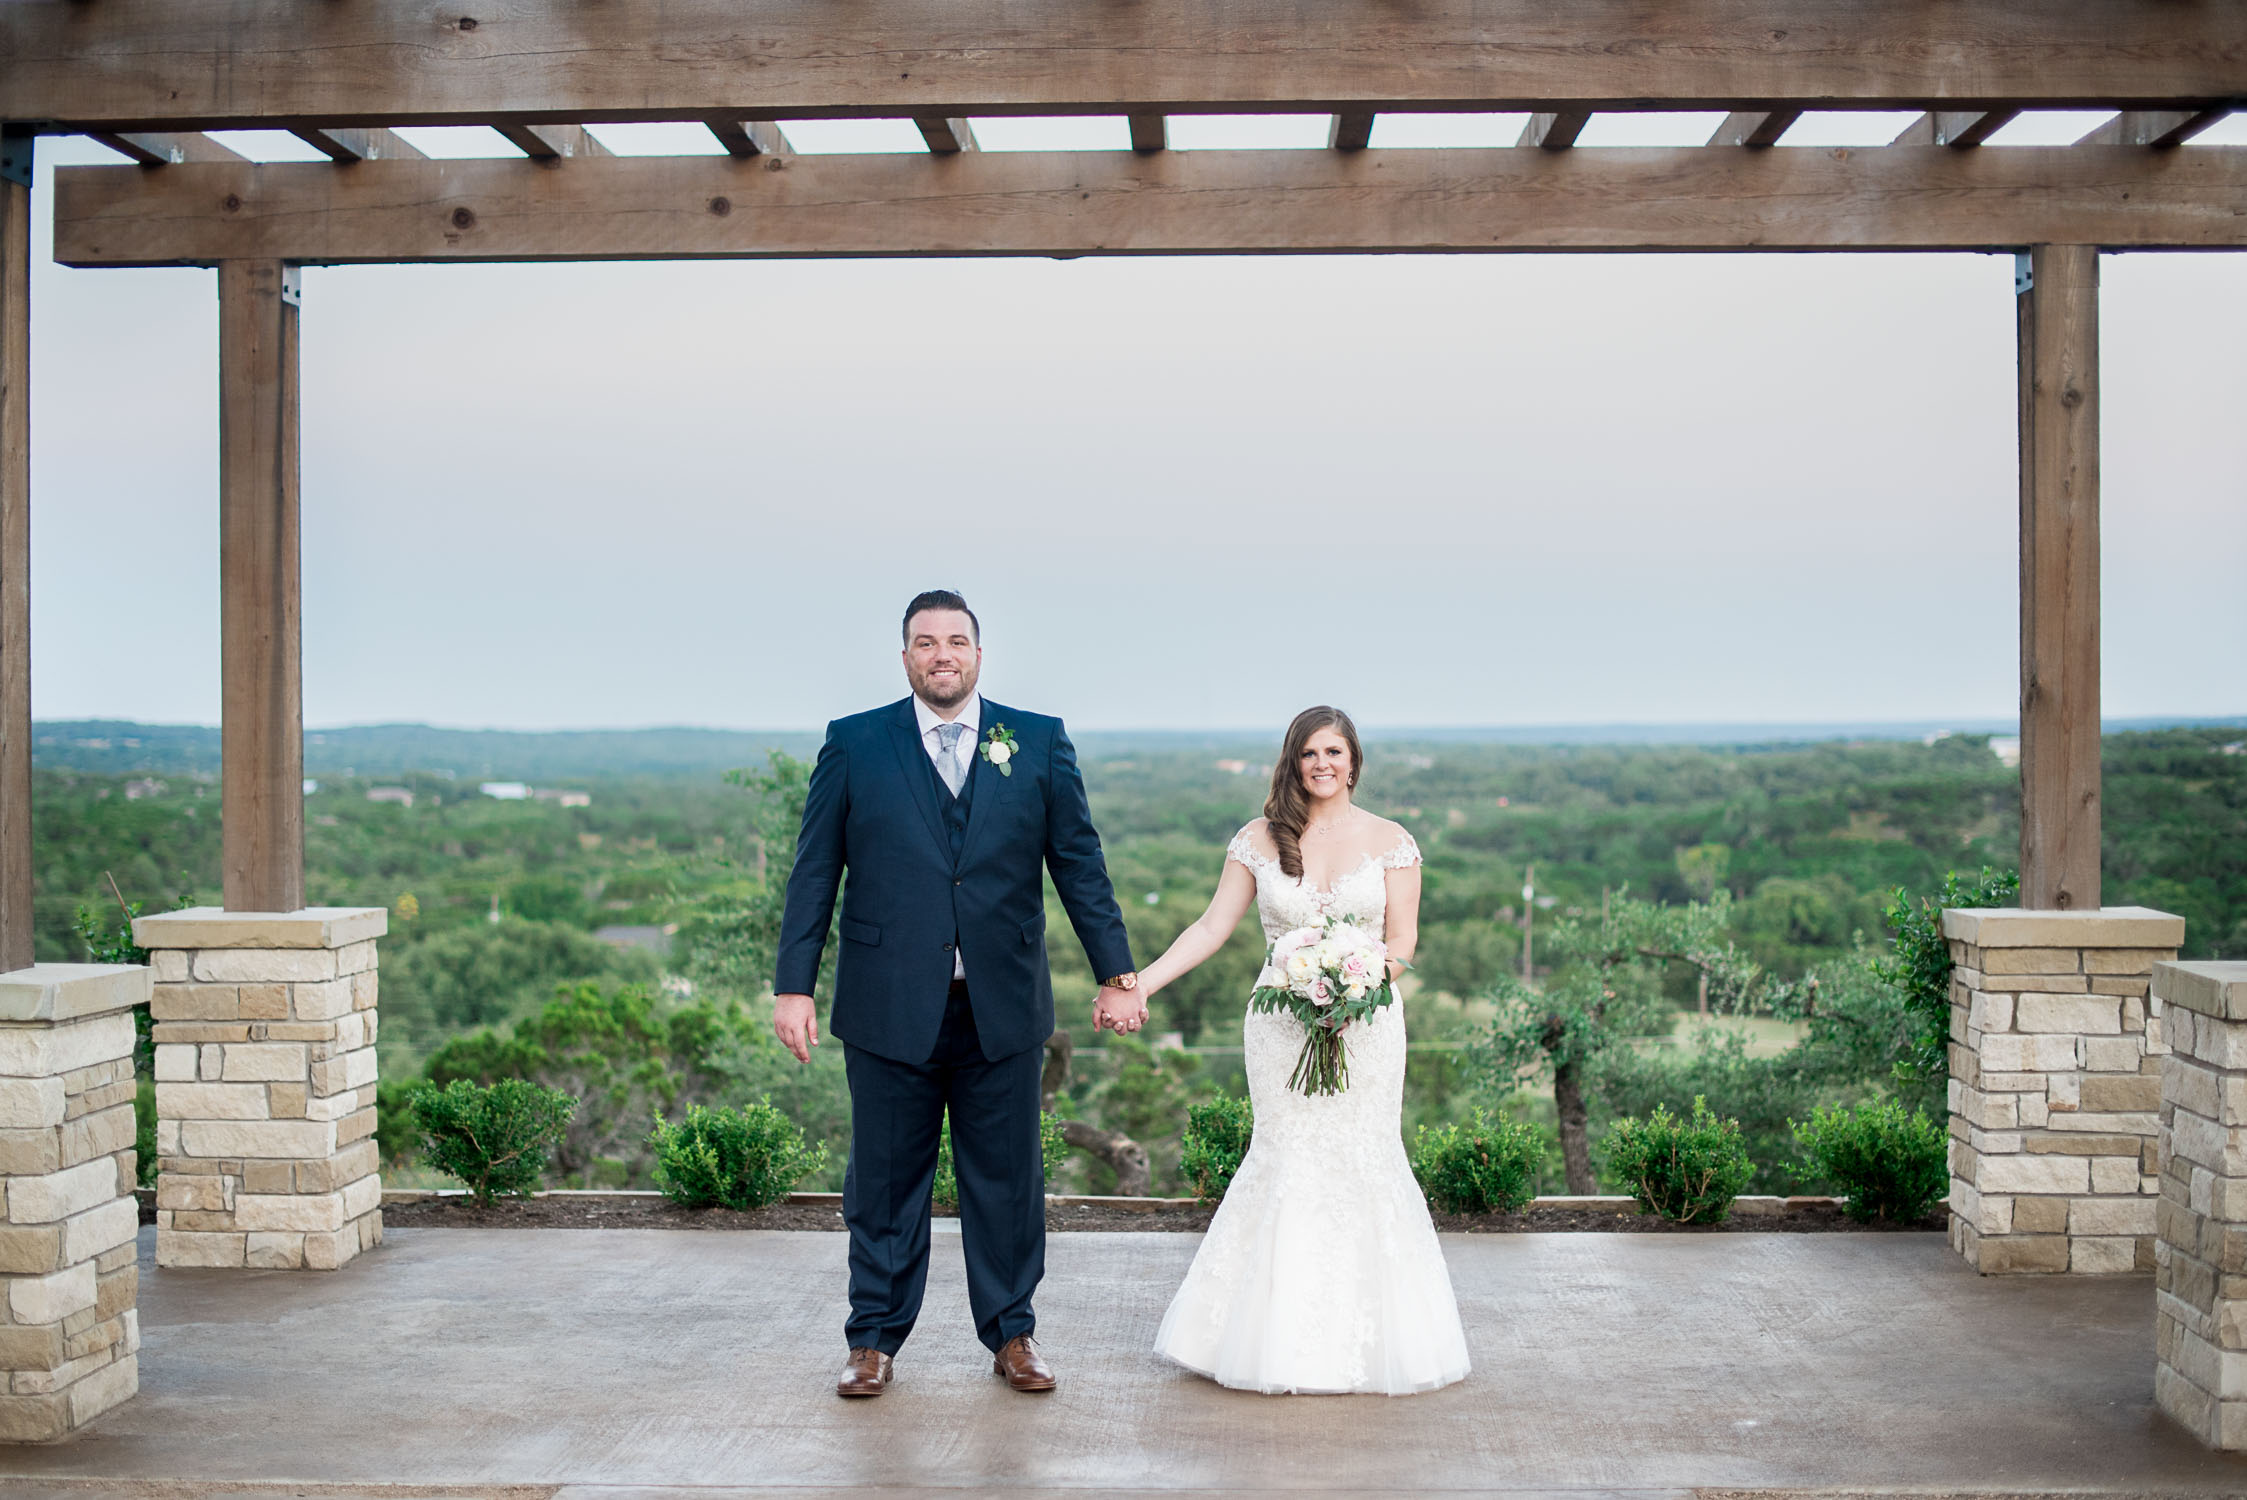 Hinton Wedding at Canyonwood Ridge Dripping Springs Texas Wedding Photography-165.jpg